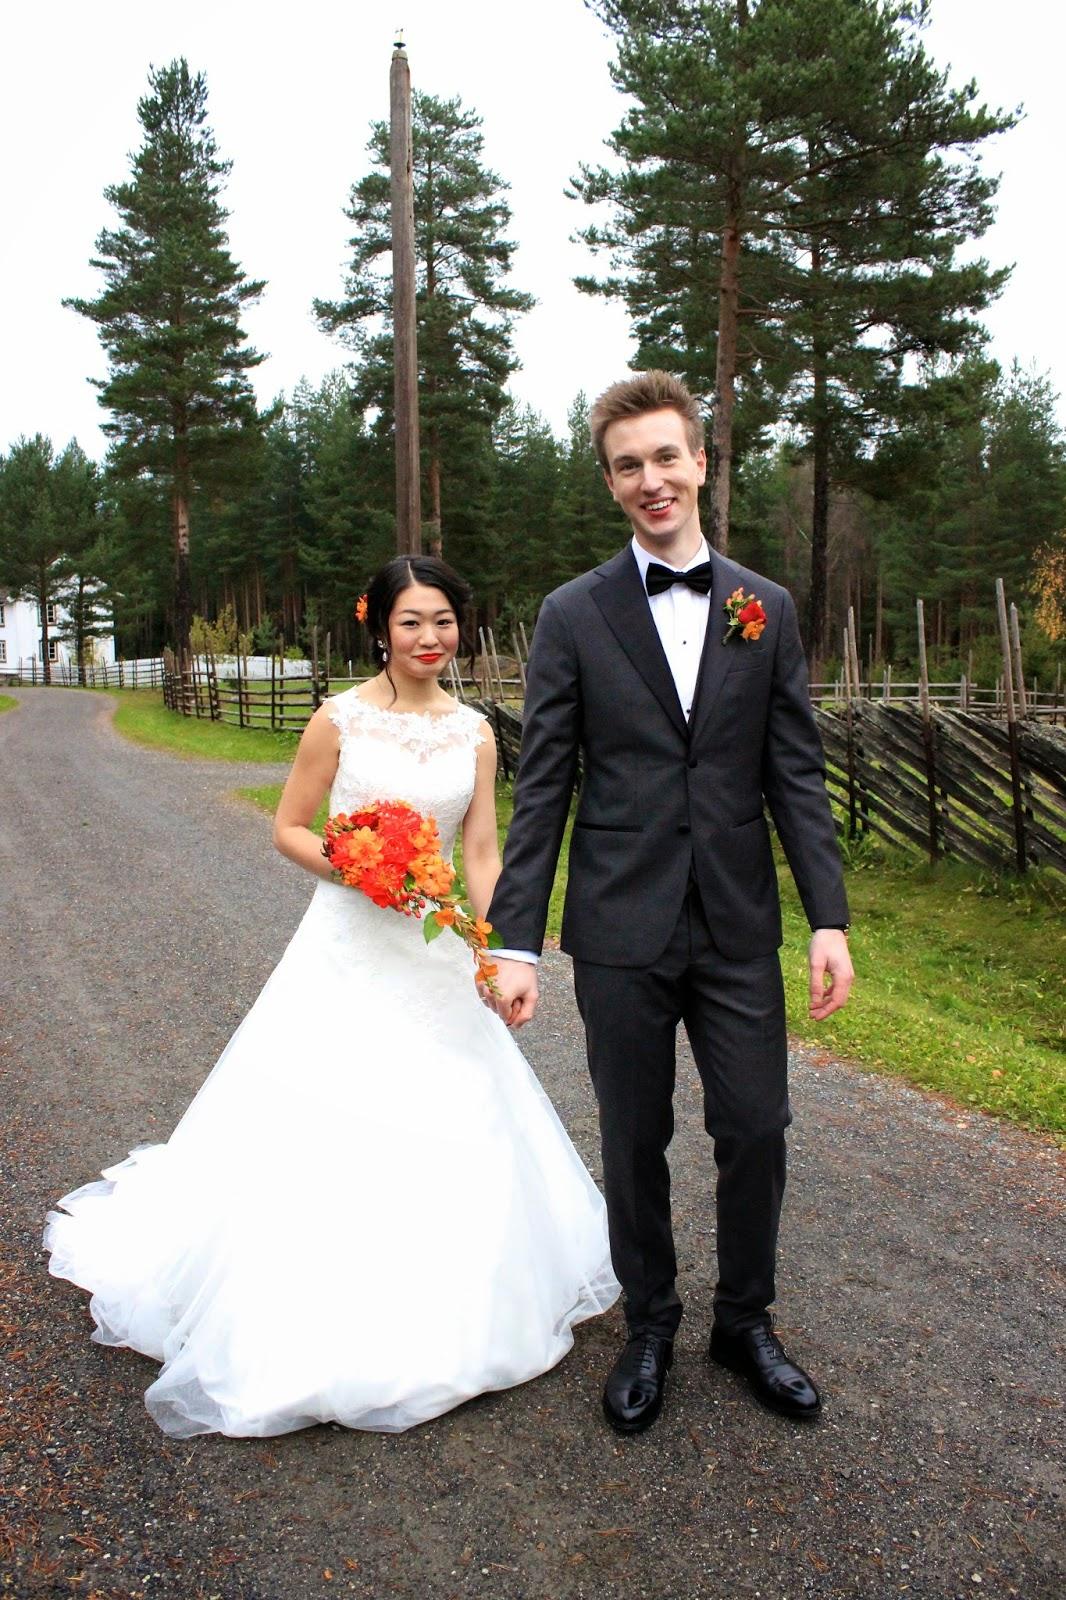 My Best Friend's Wedding in Norway